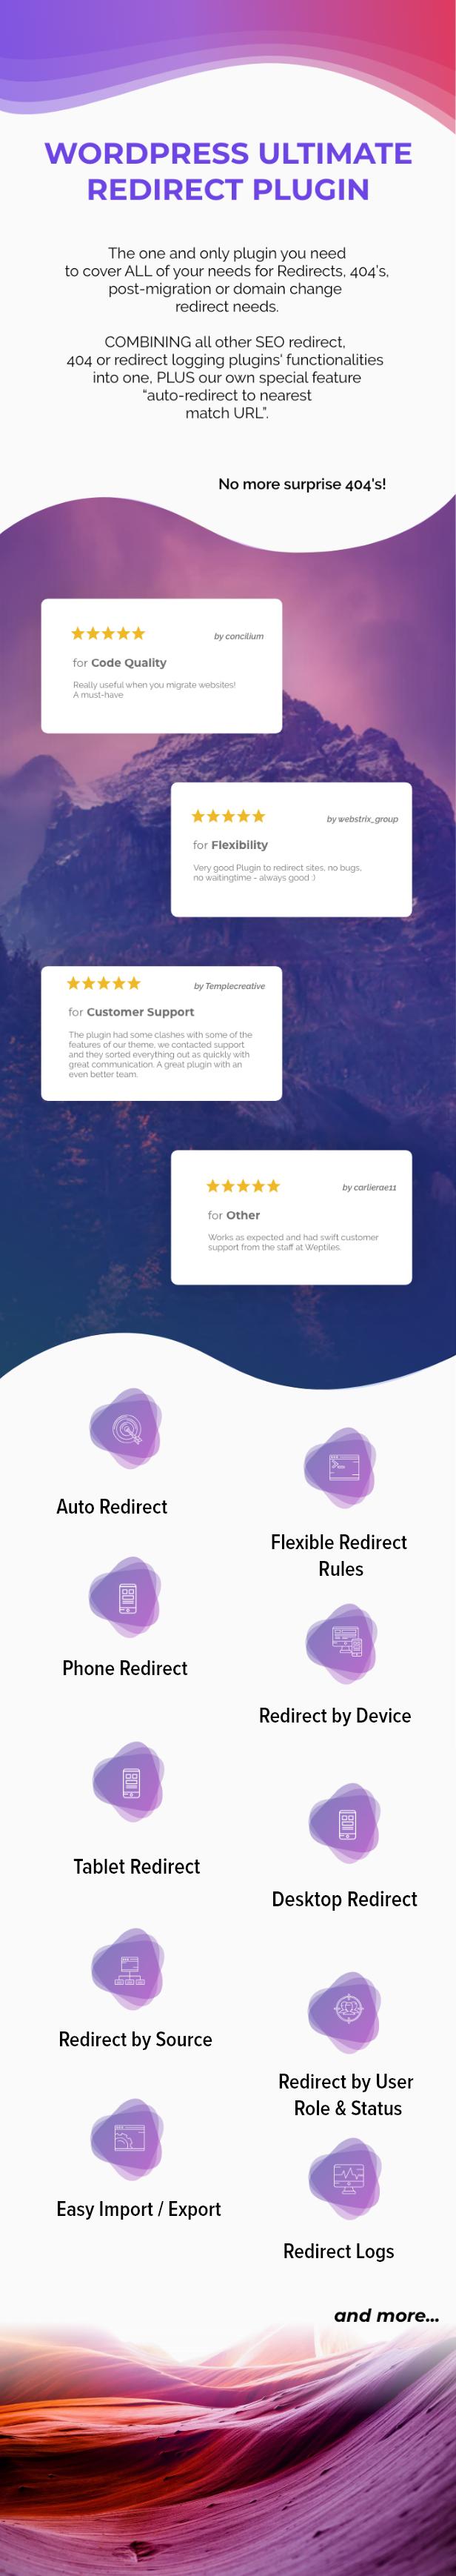 WordPress Ultimate Redirect Plugin - (with Auto-Redirect 404's)